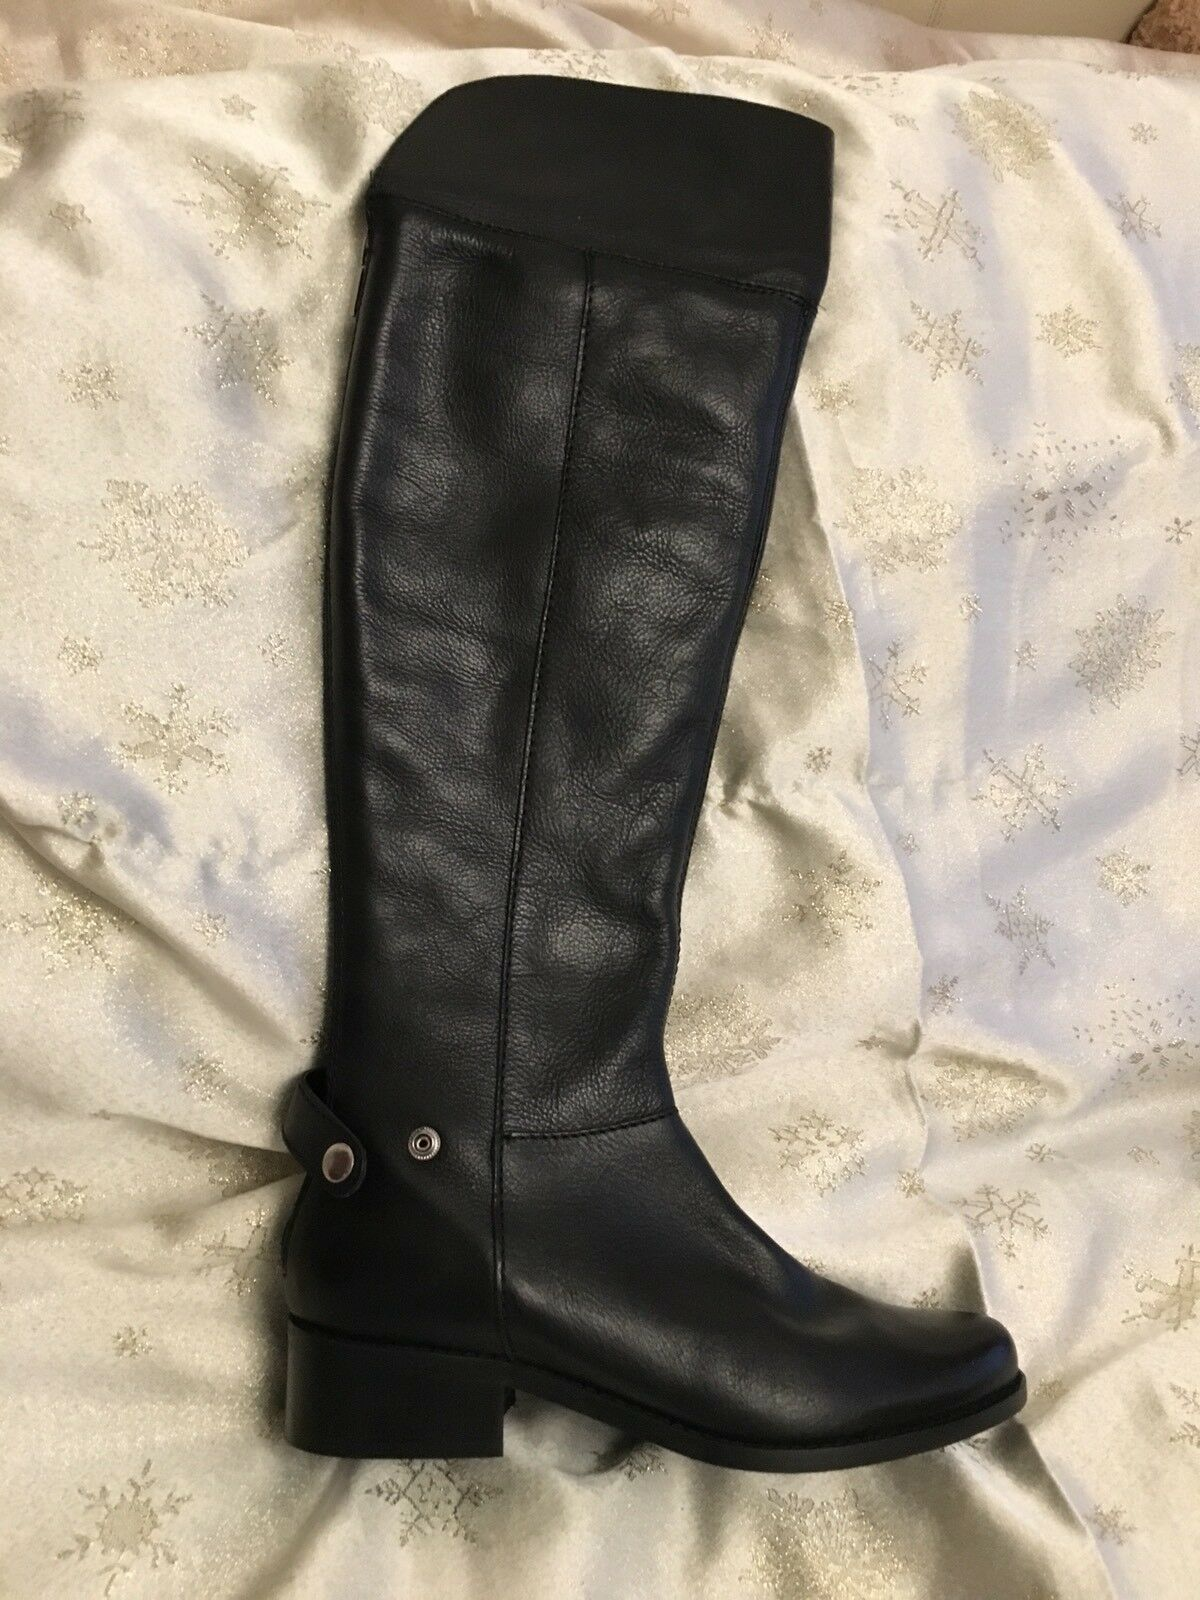 Dune Black Leathers Boots Sz 5 New  178